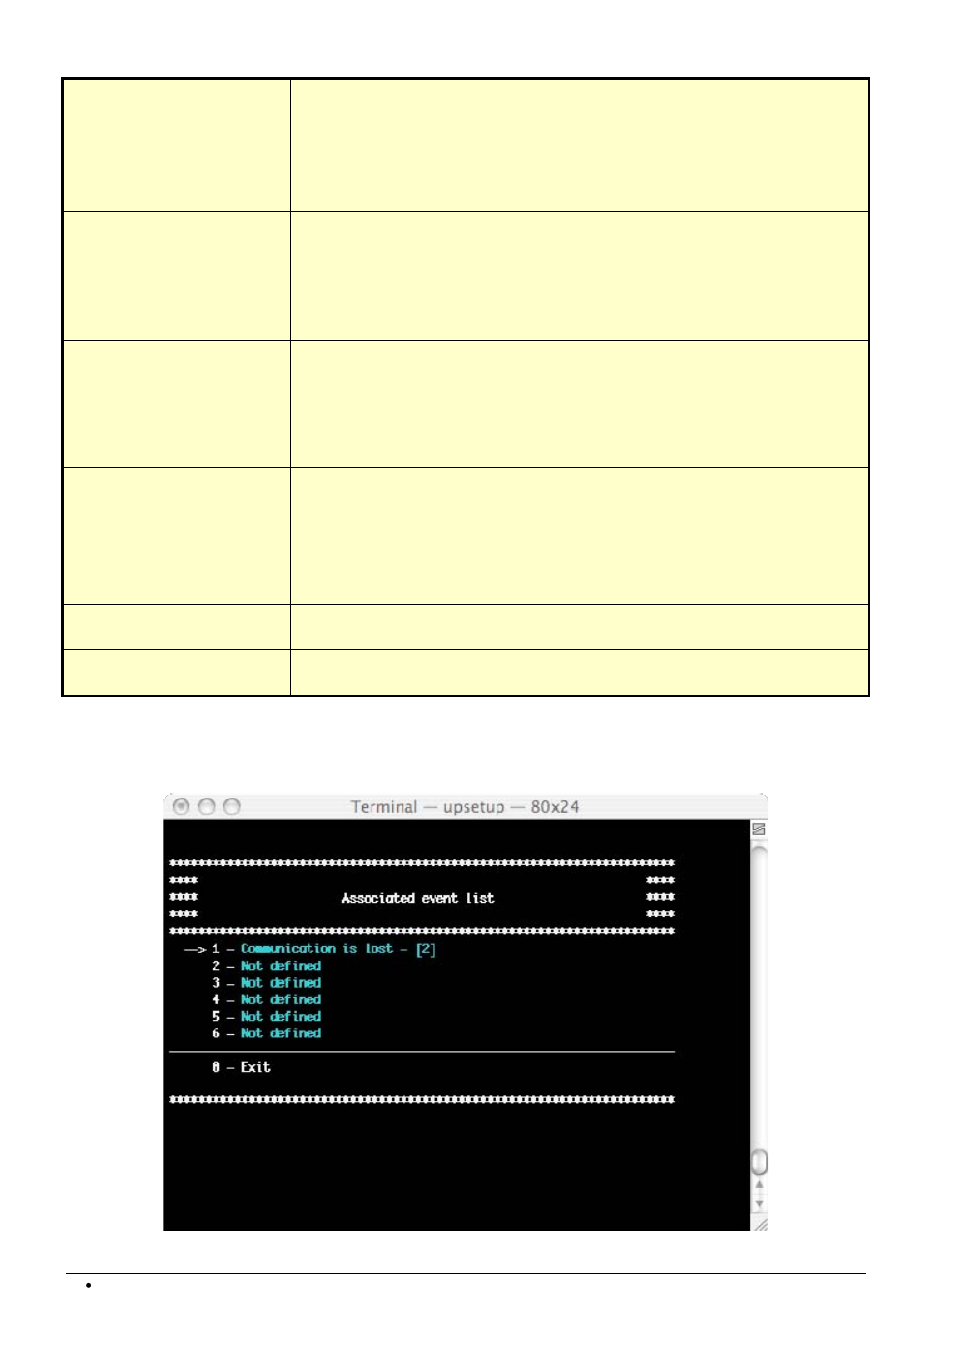 Riello UPS PowerShield³ User Manual   Page 46 / 83